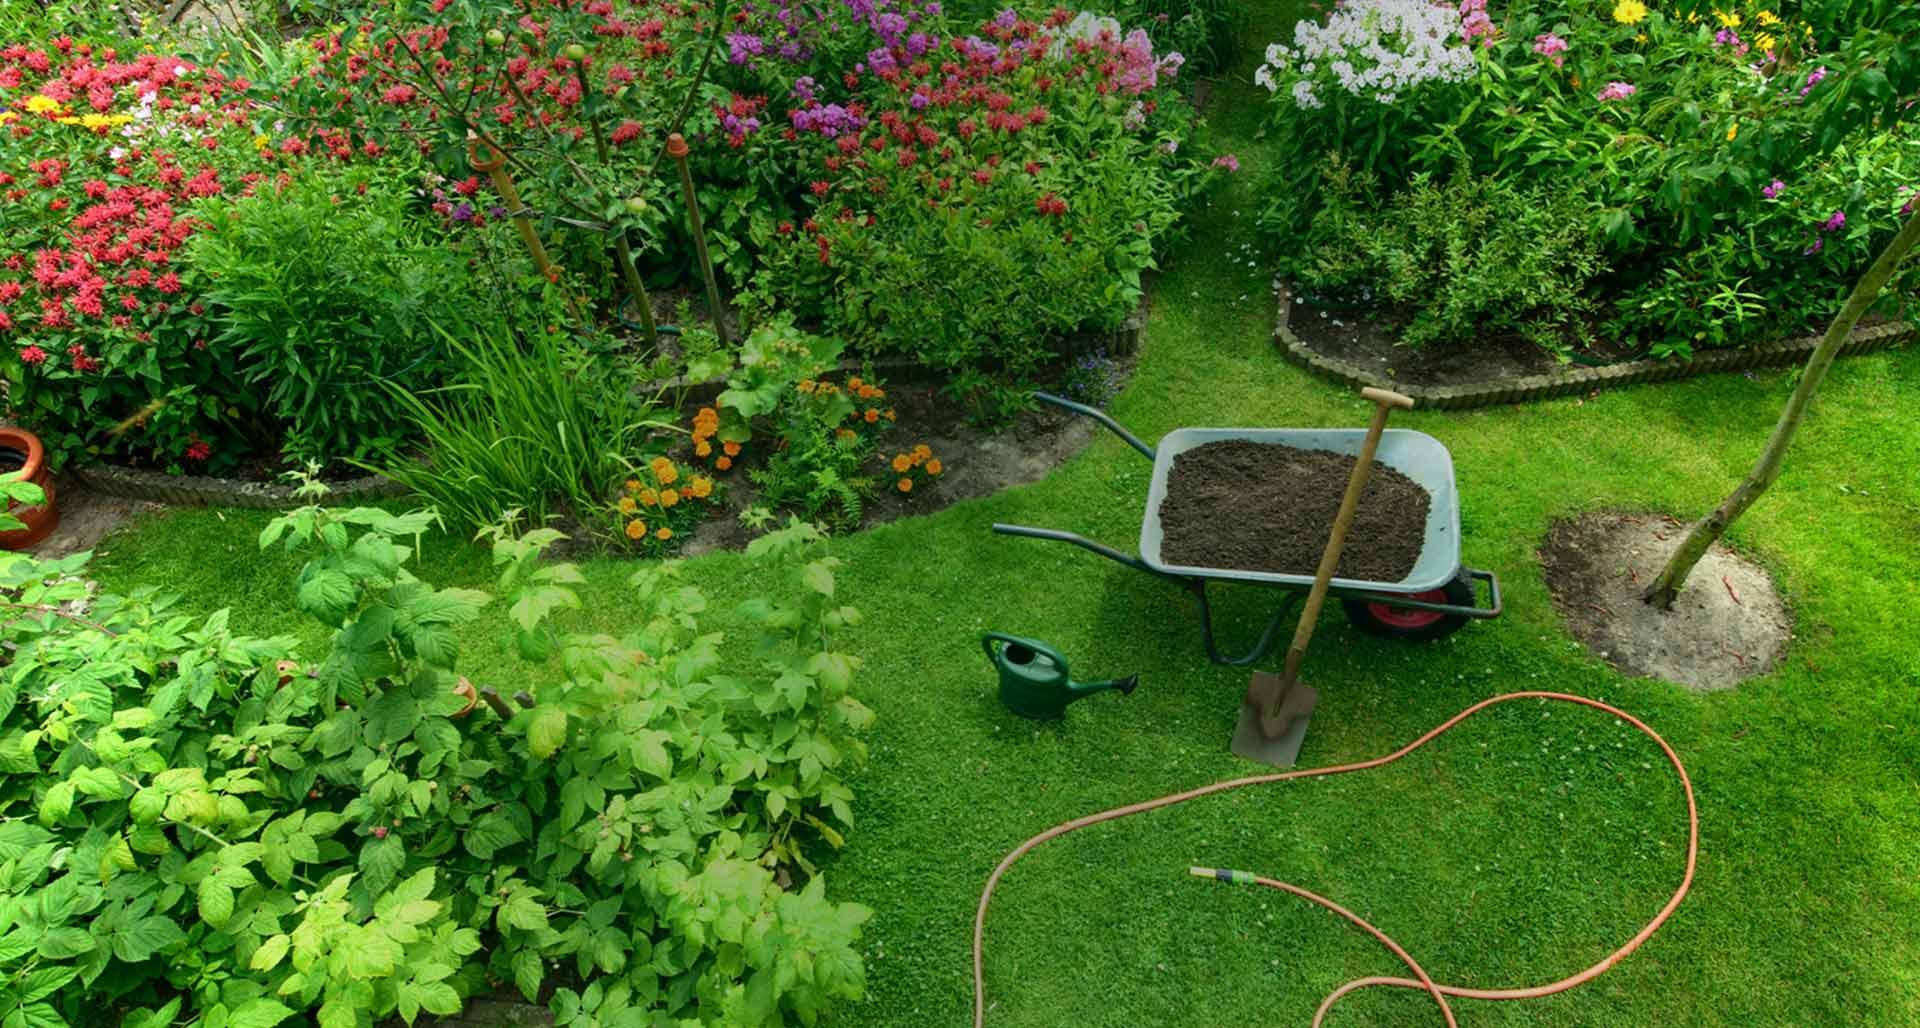 Jardineries Truffaut : Spécialiste Jardin, Animaux, Maison ... serapportantà Petit Bassin Pour Jardin